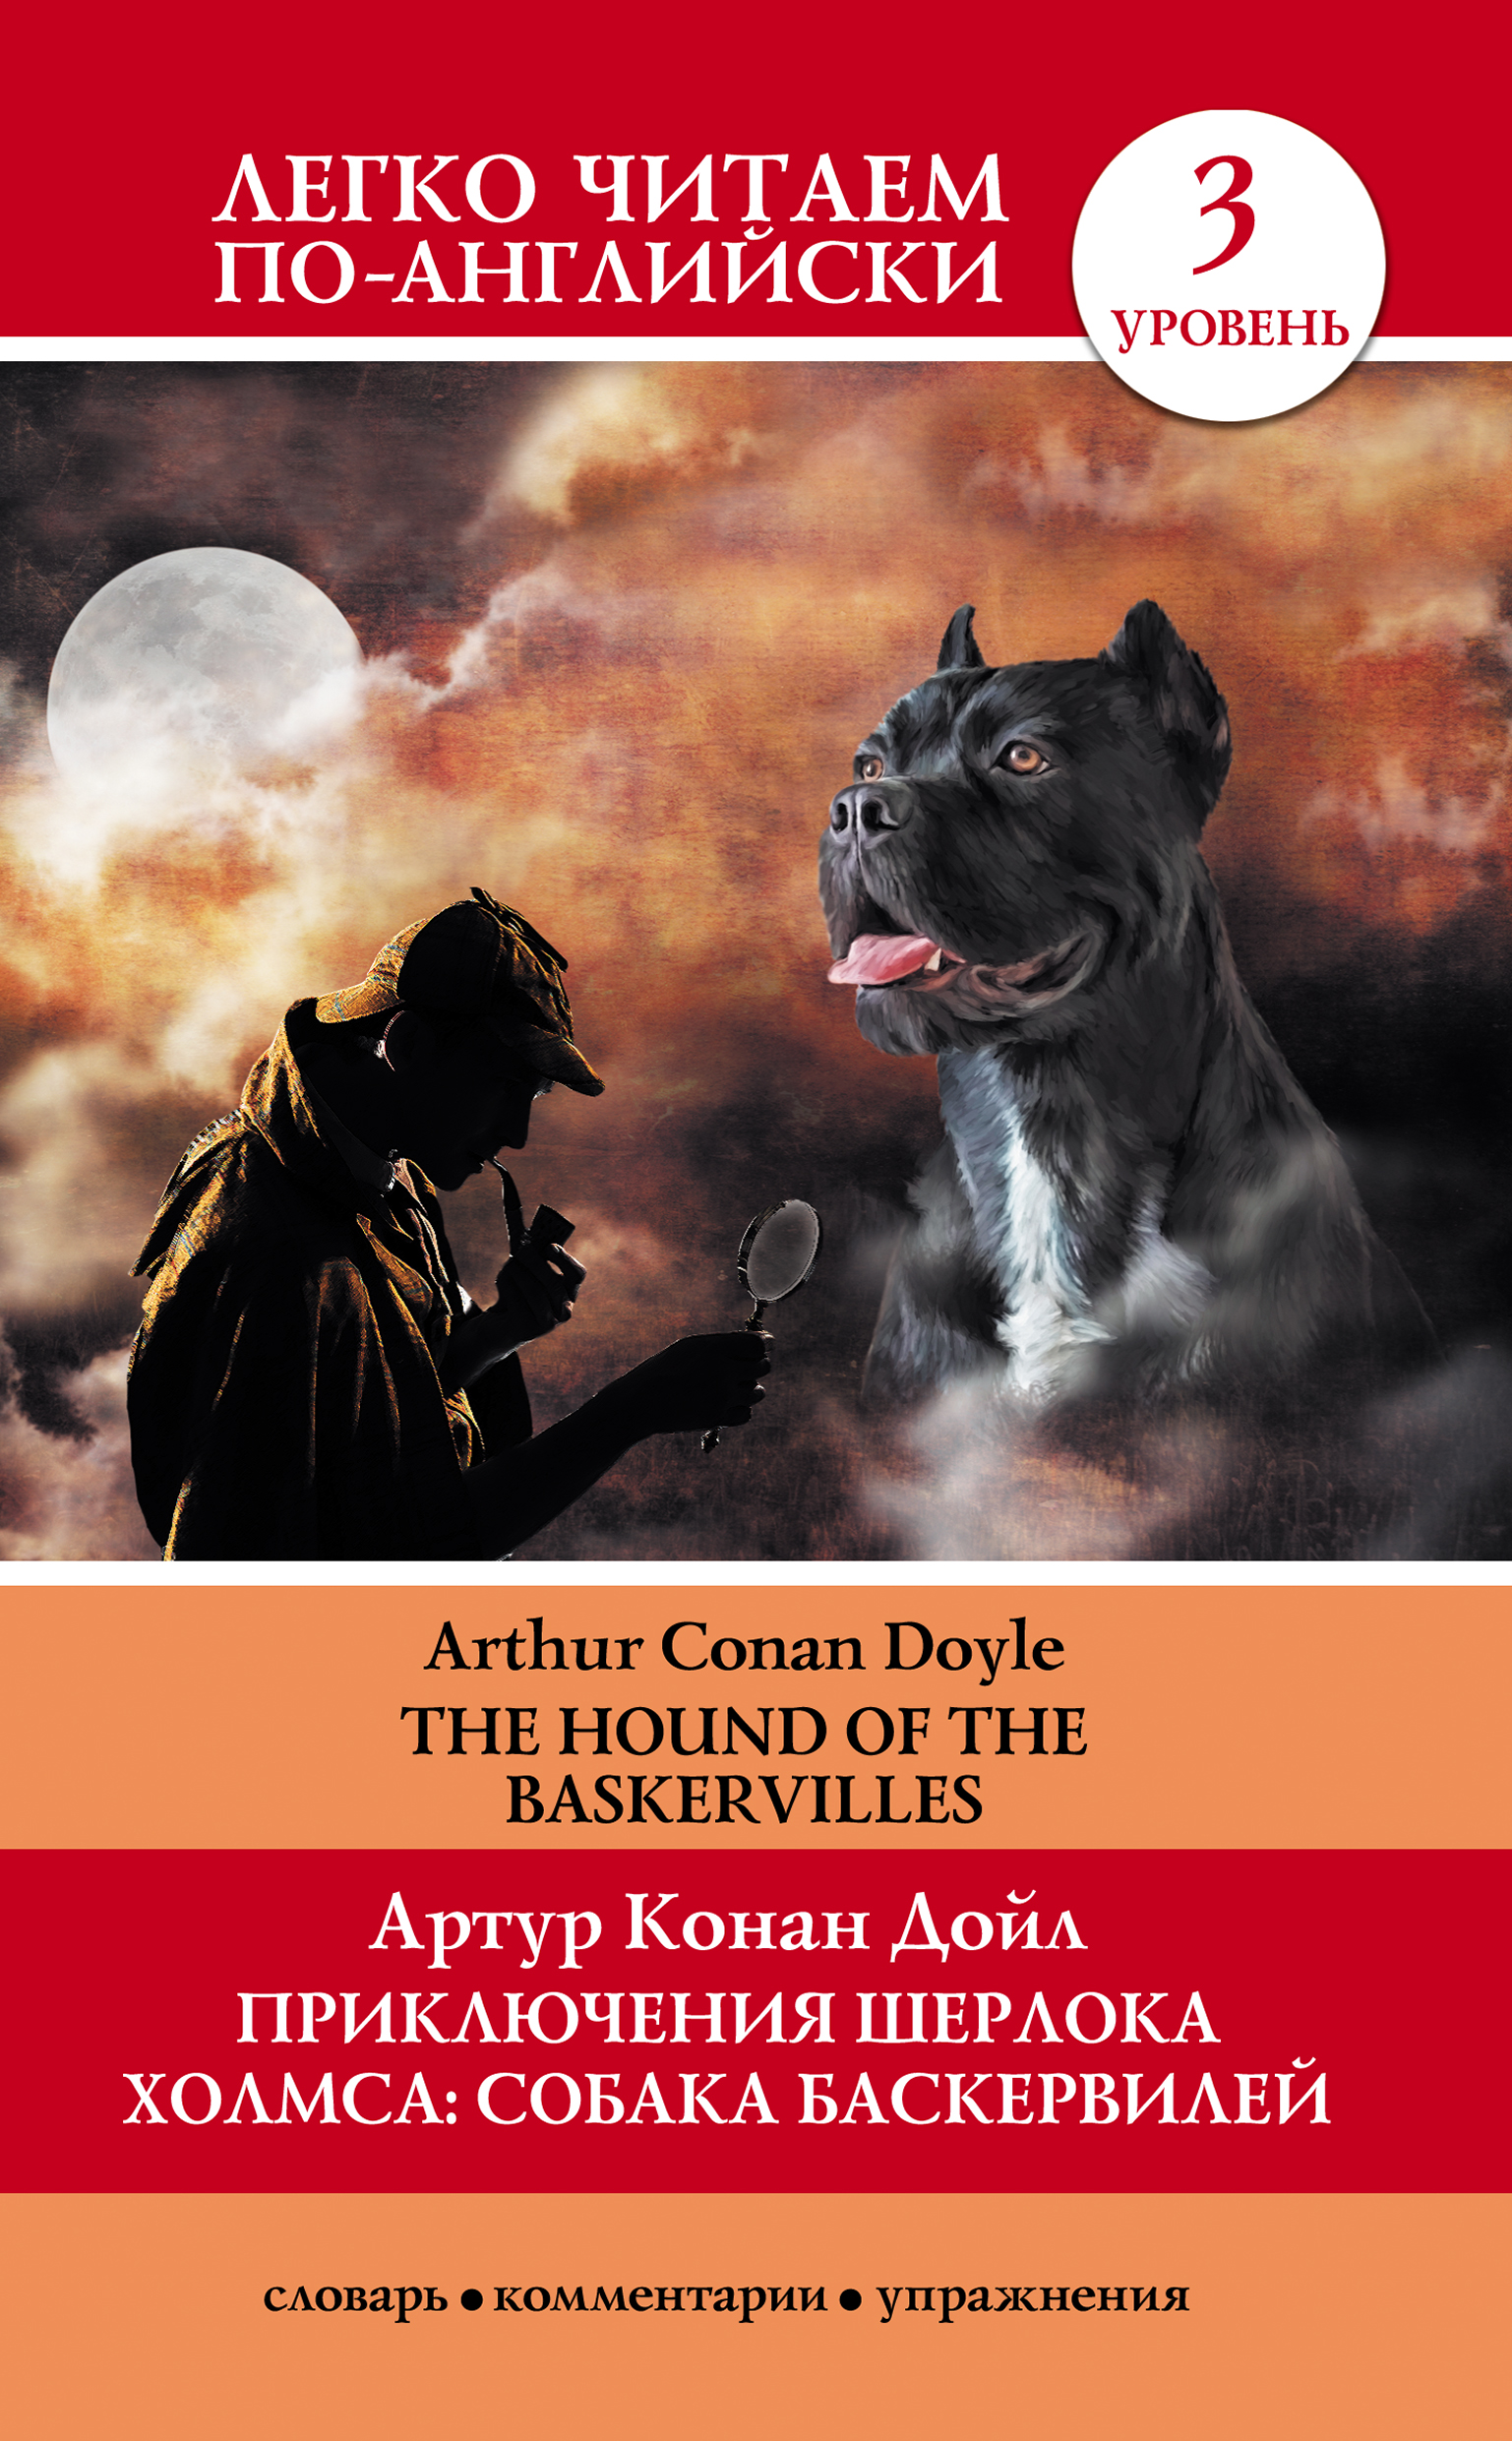 Артур Конан Дойл Приключения Шерлока Холмса: Собака Баскервилей / The Hound of the Baskervilles